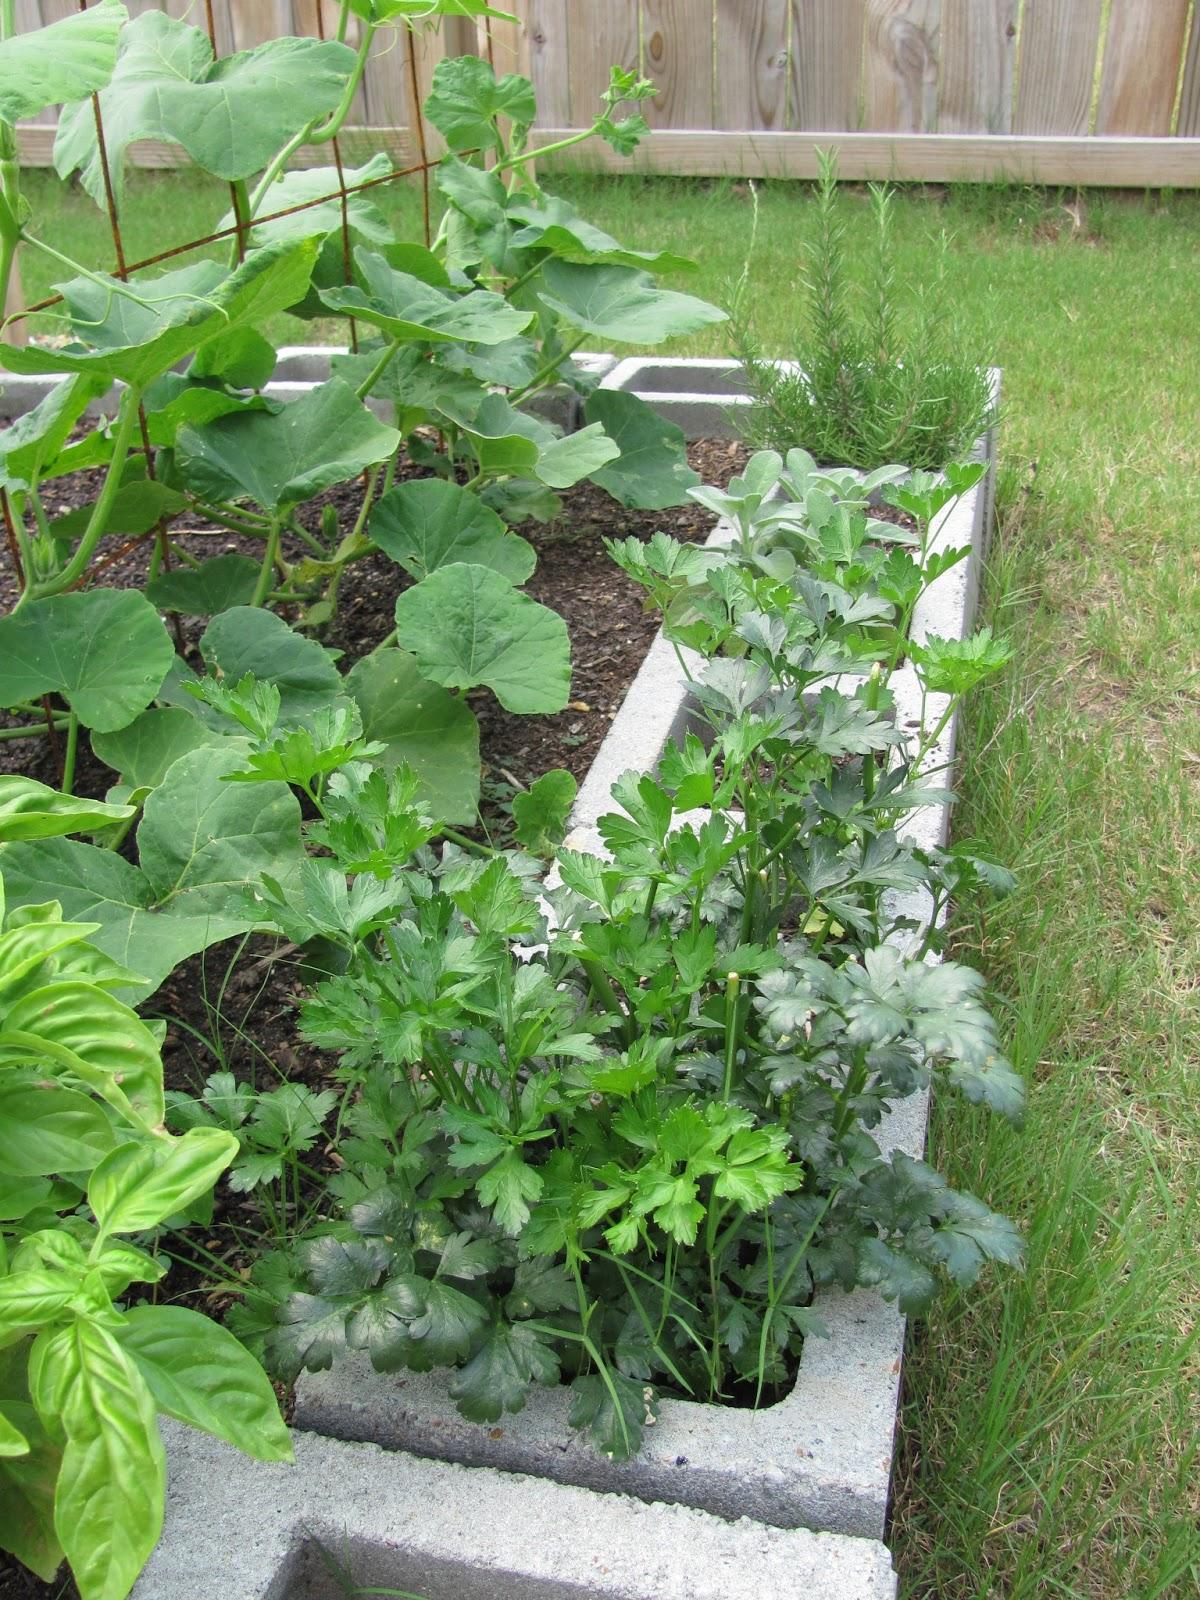 Angelyn's Rambelyns: Cinder Block Garden Update: Summer 2013